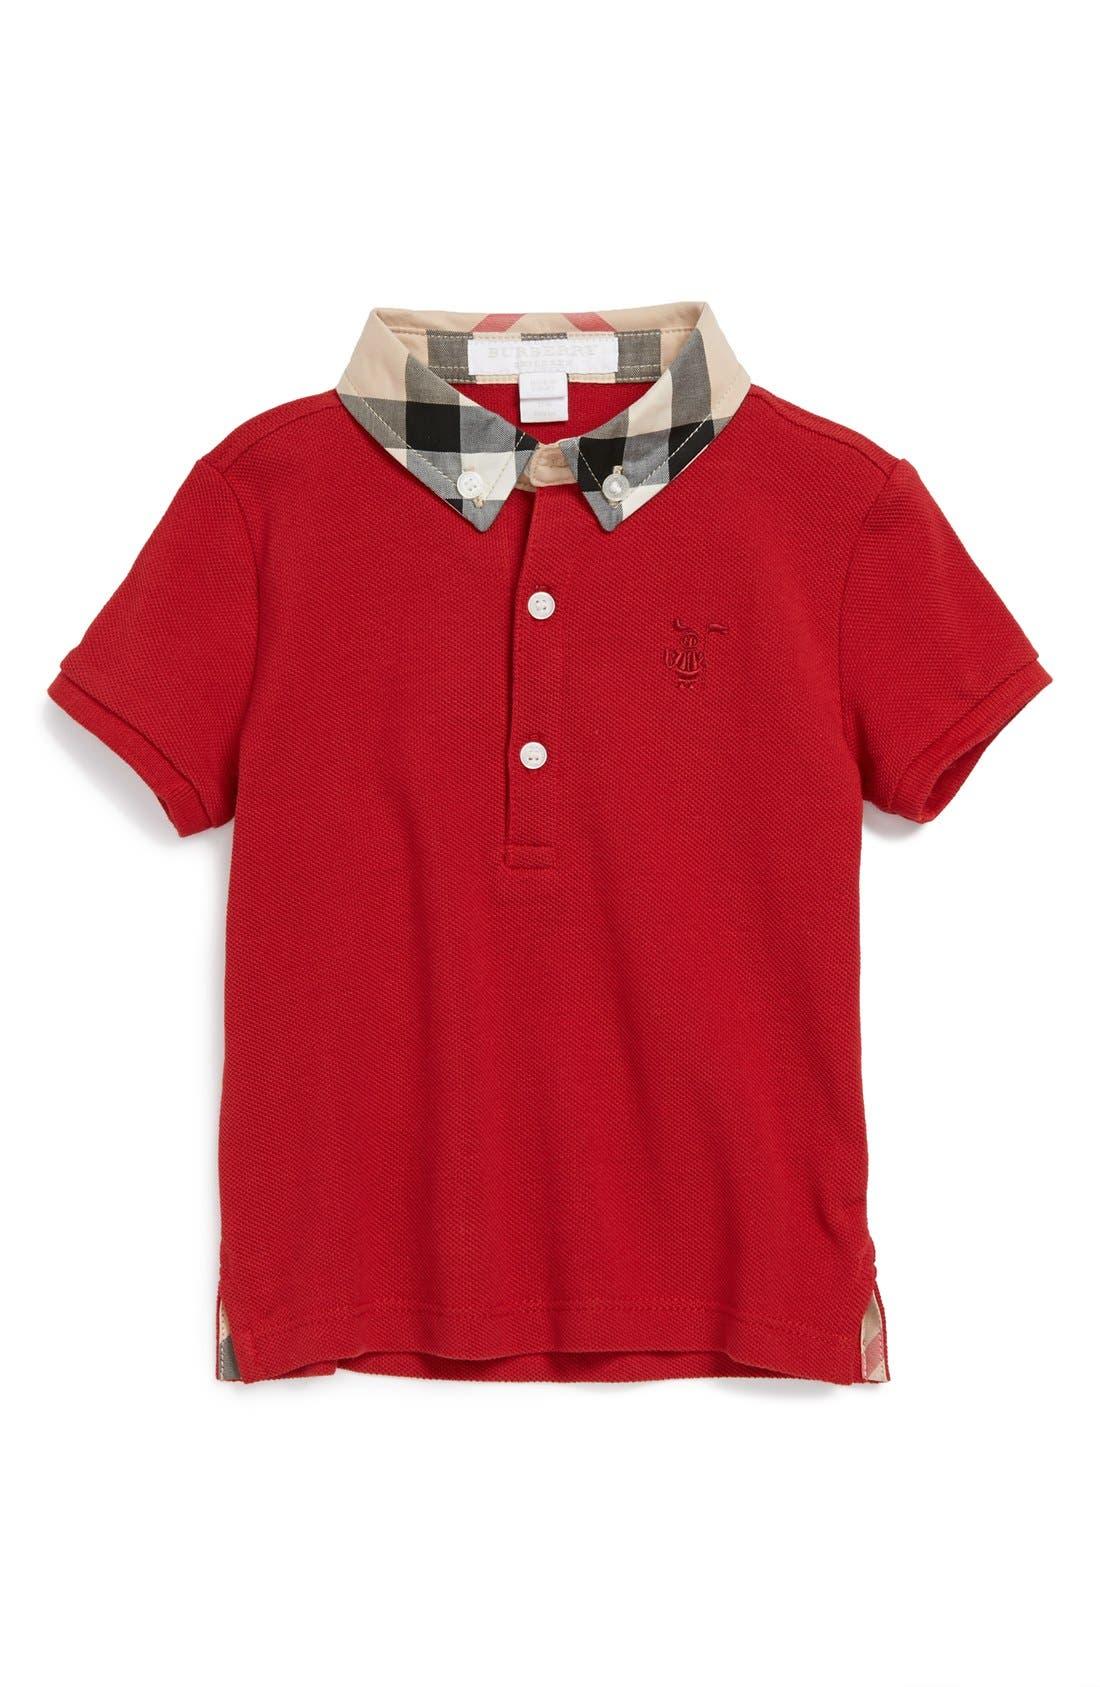 'William' Cotton Polo,                         Main,                         color, Military Red